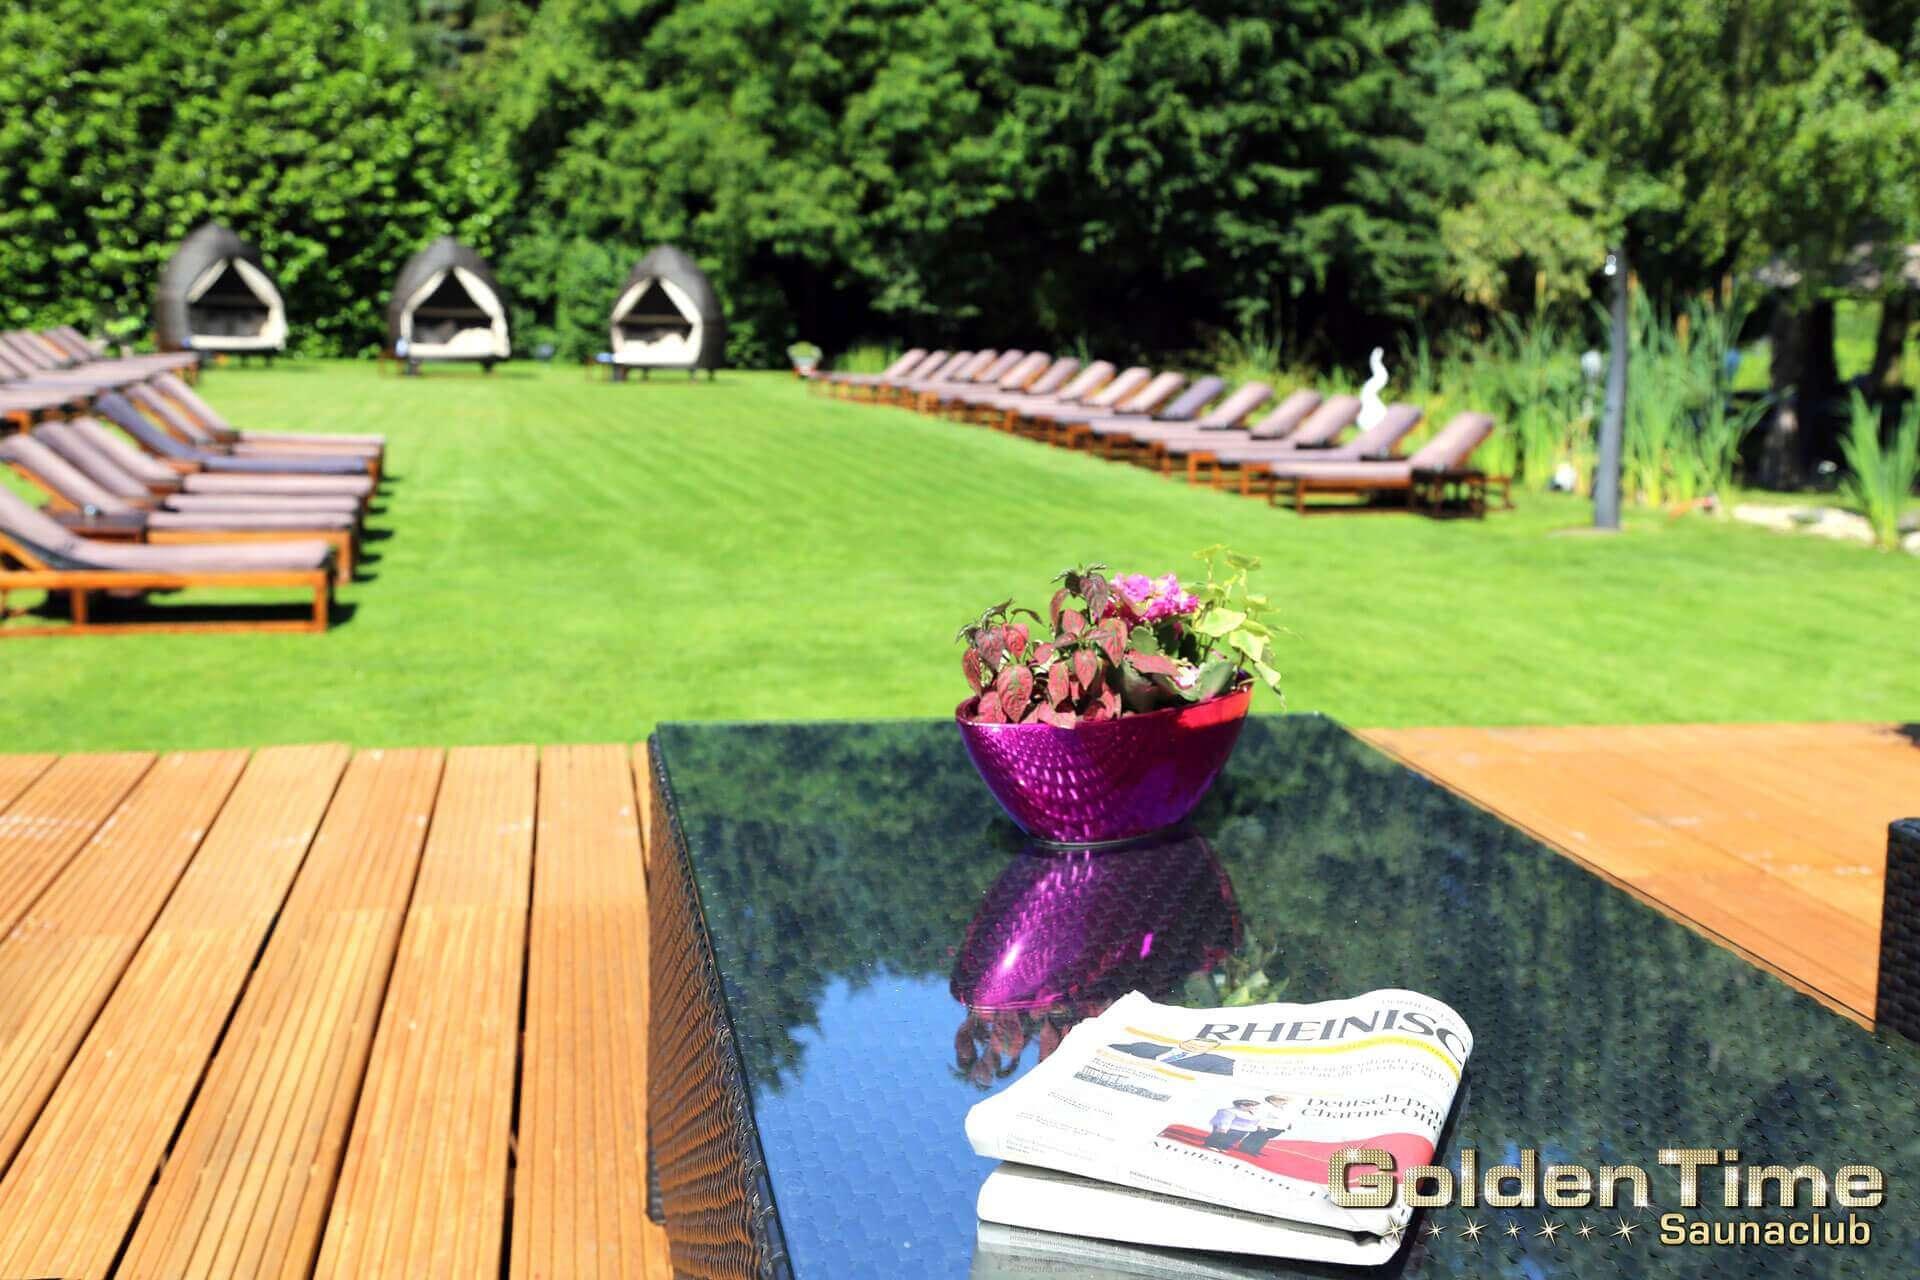 01-terrasse-pic-09-goldentime-saunaclub.jpg